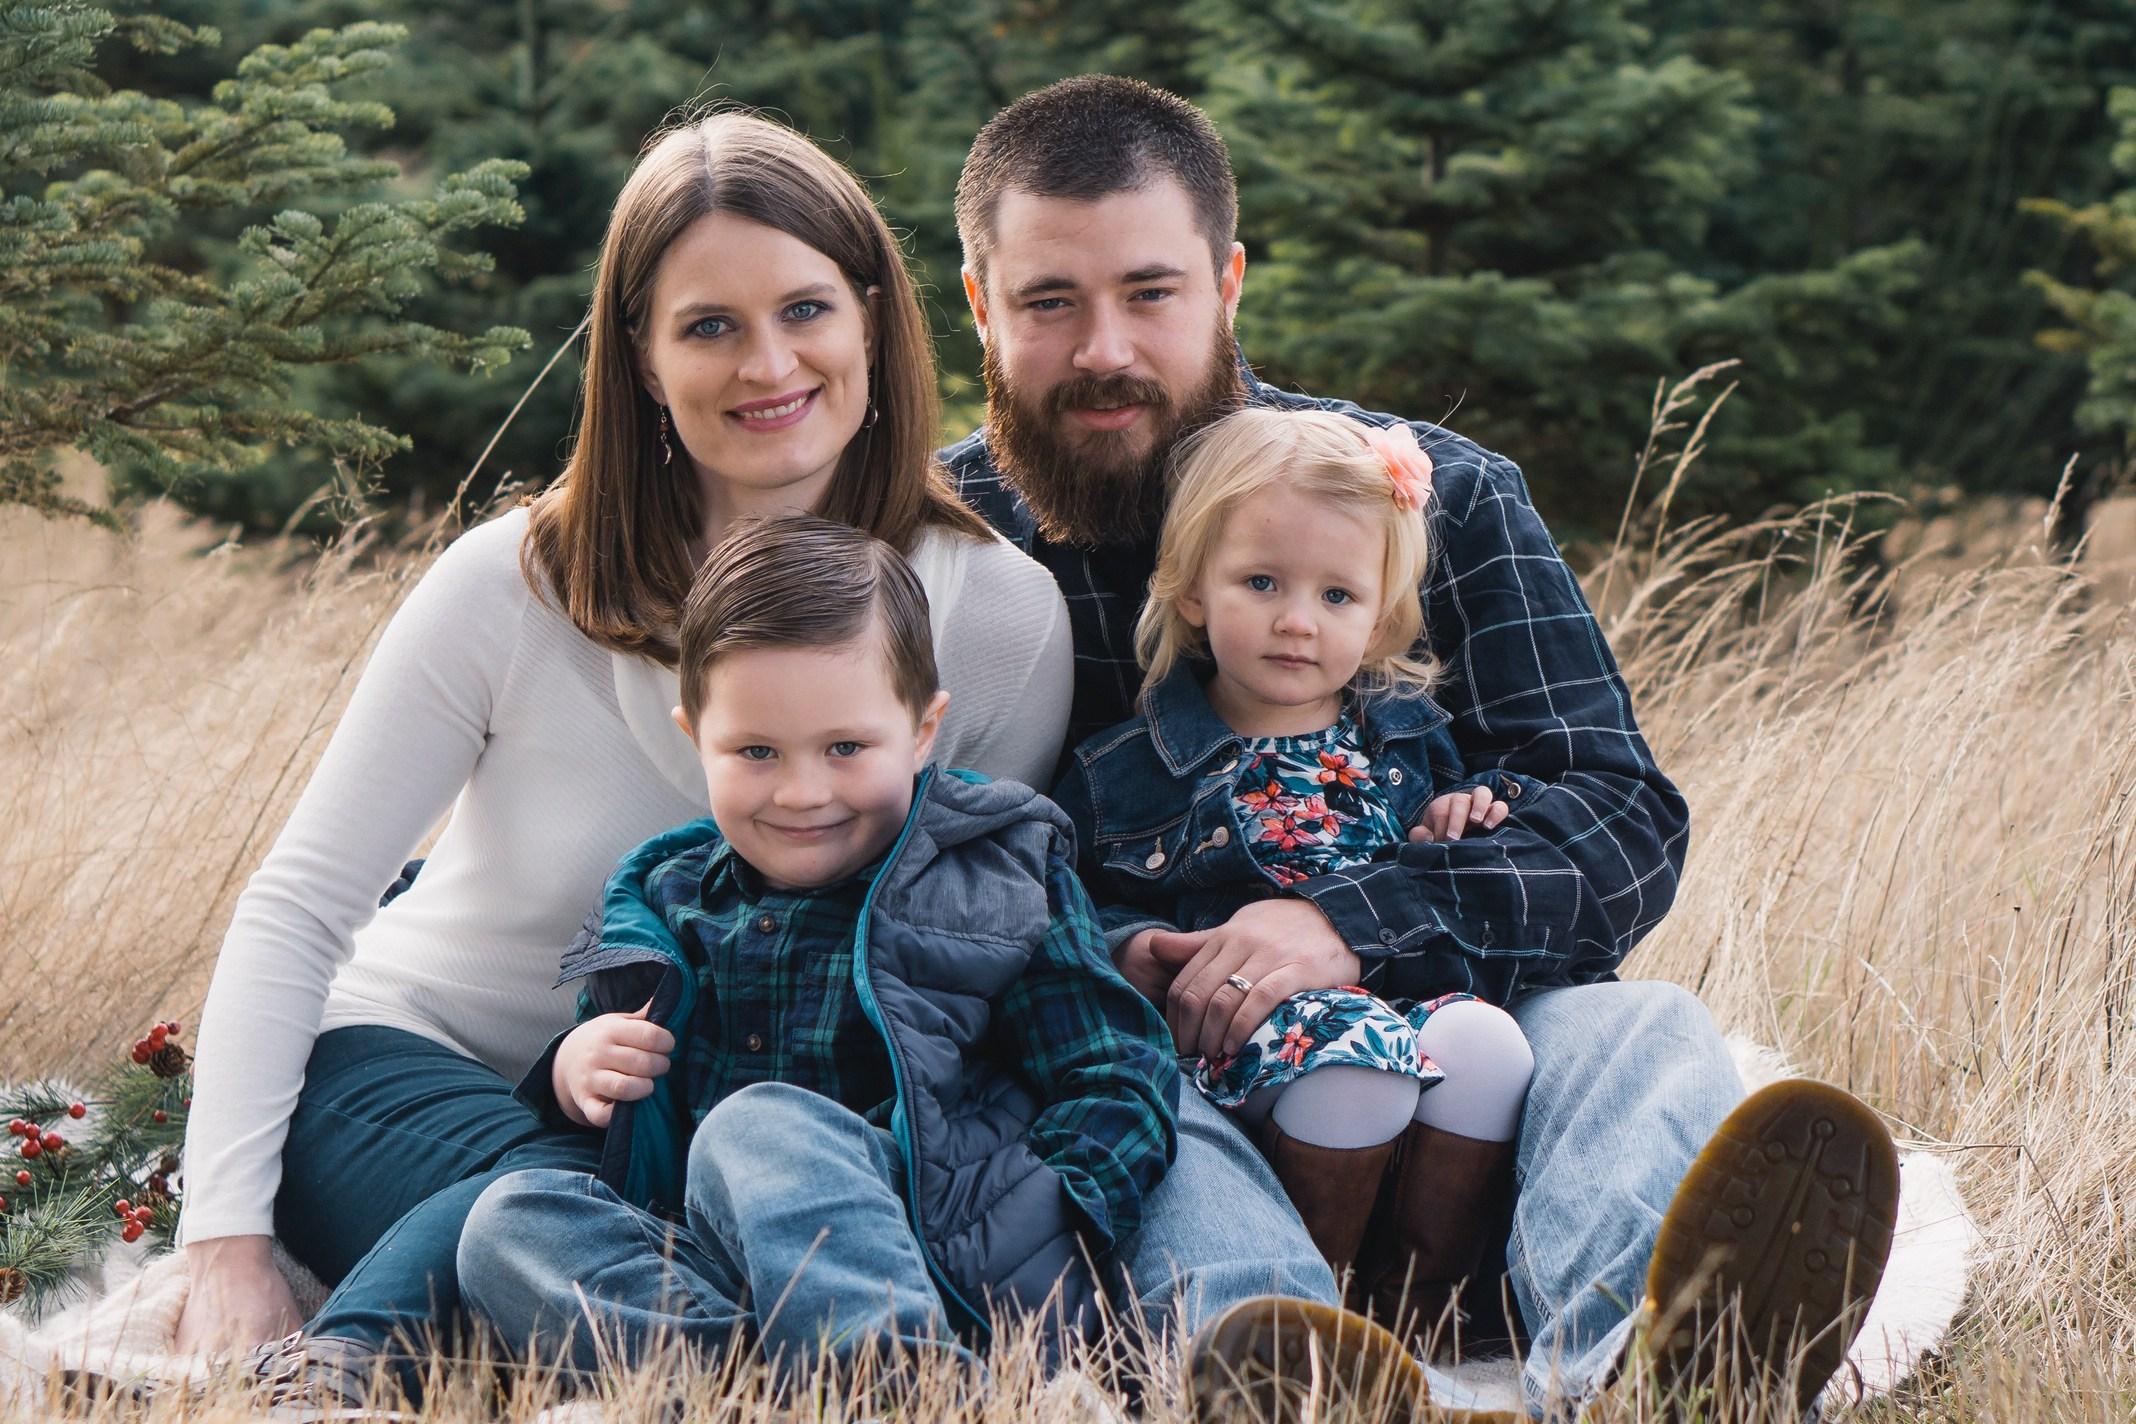 family_unsplash1.jpg